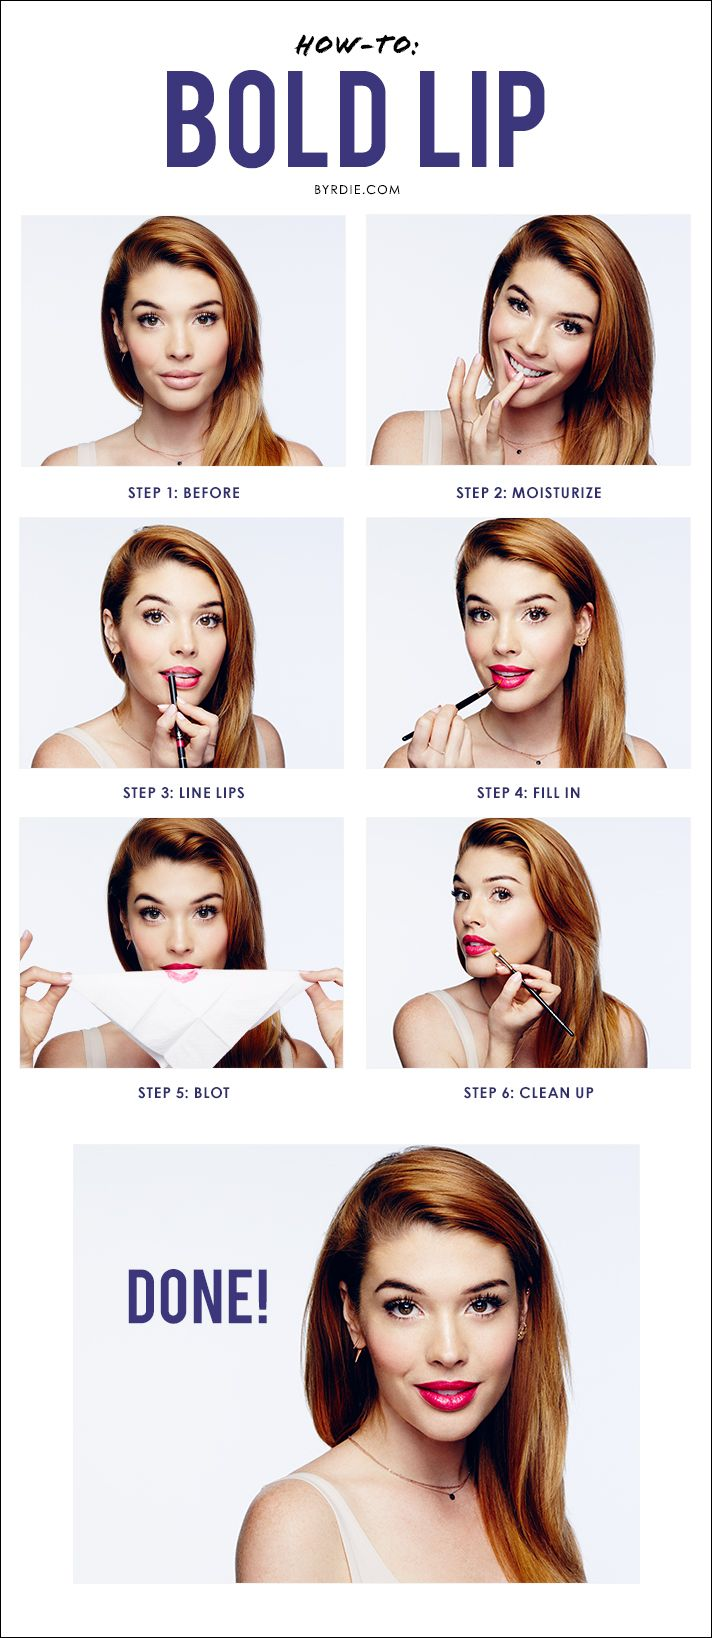 Top celebrity #makeup artist Lauren Andersen demonstrates a step-by-step #tutori...